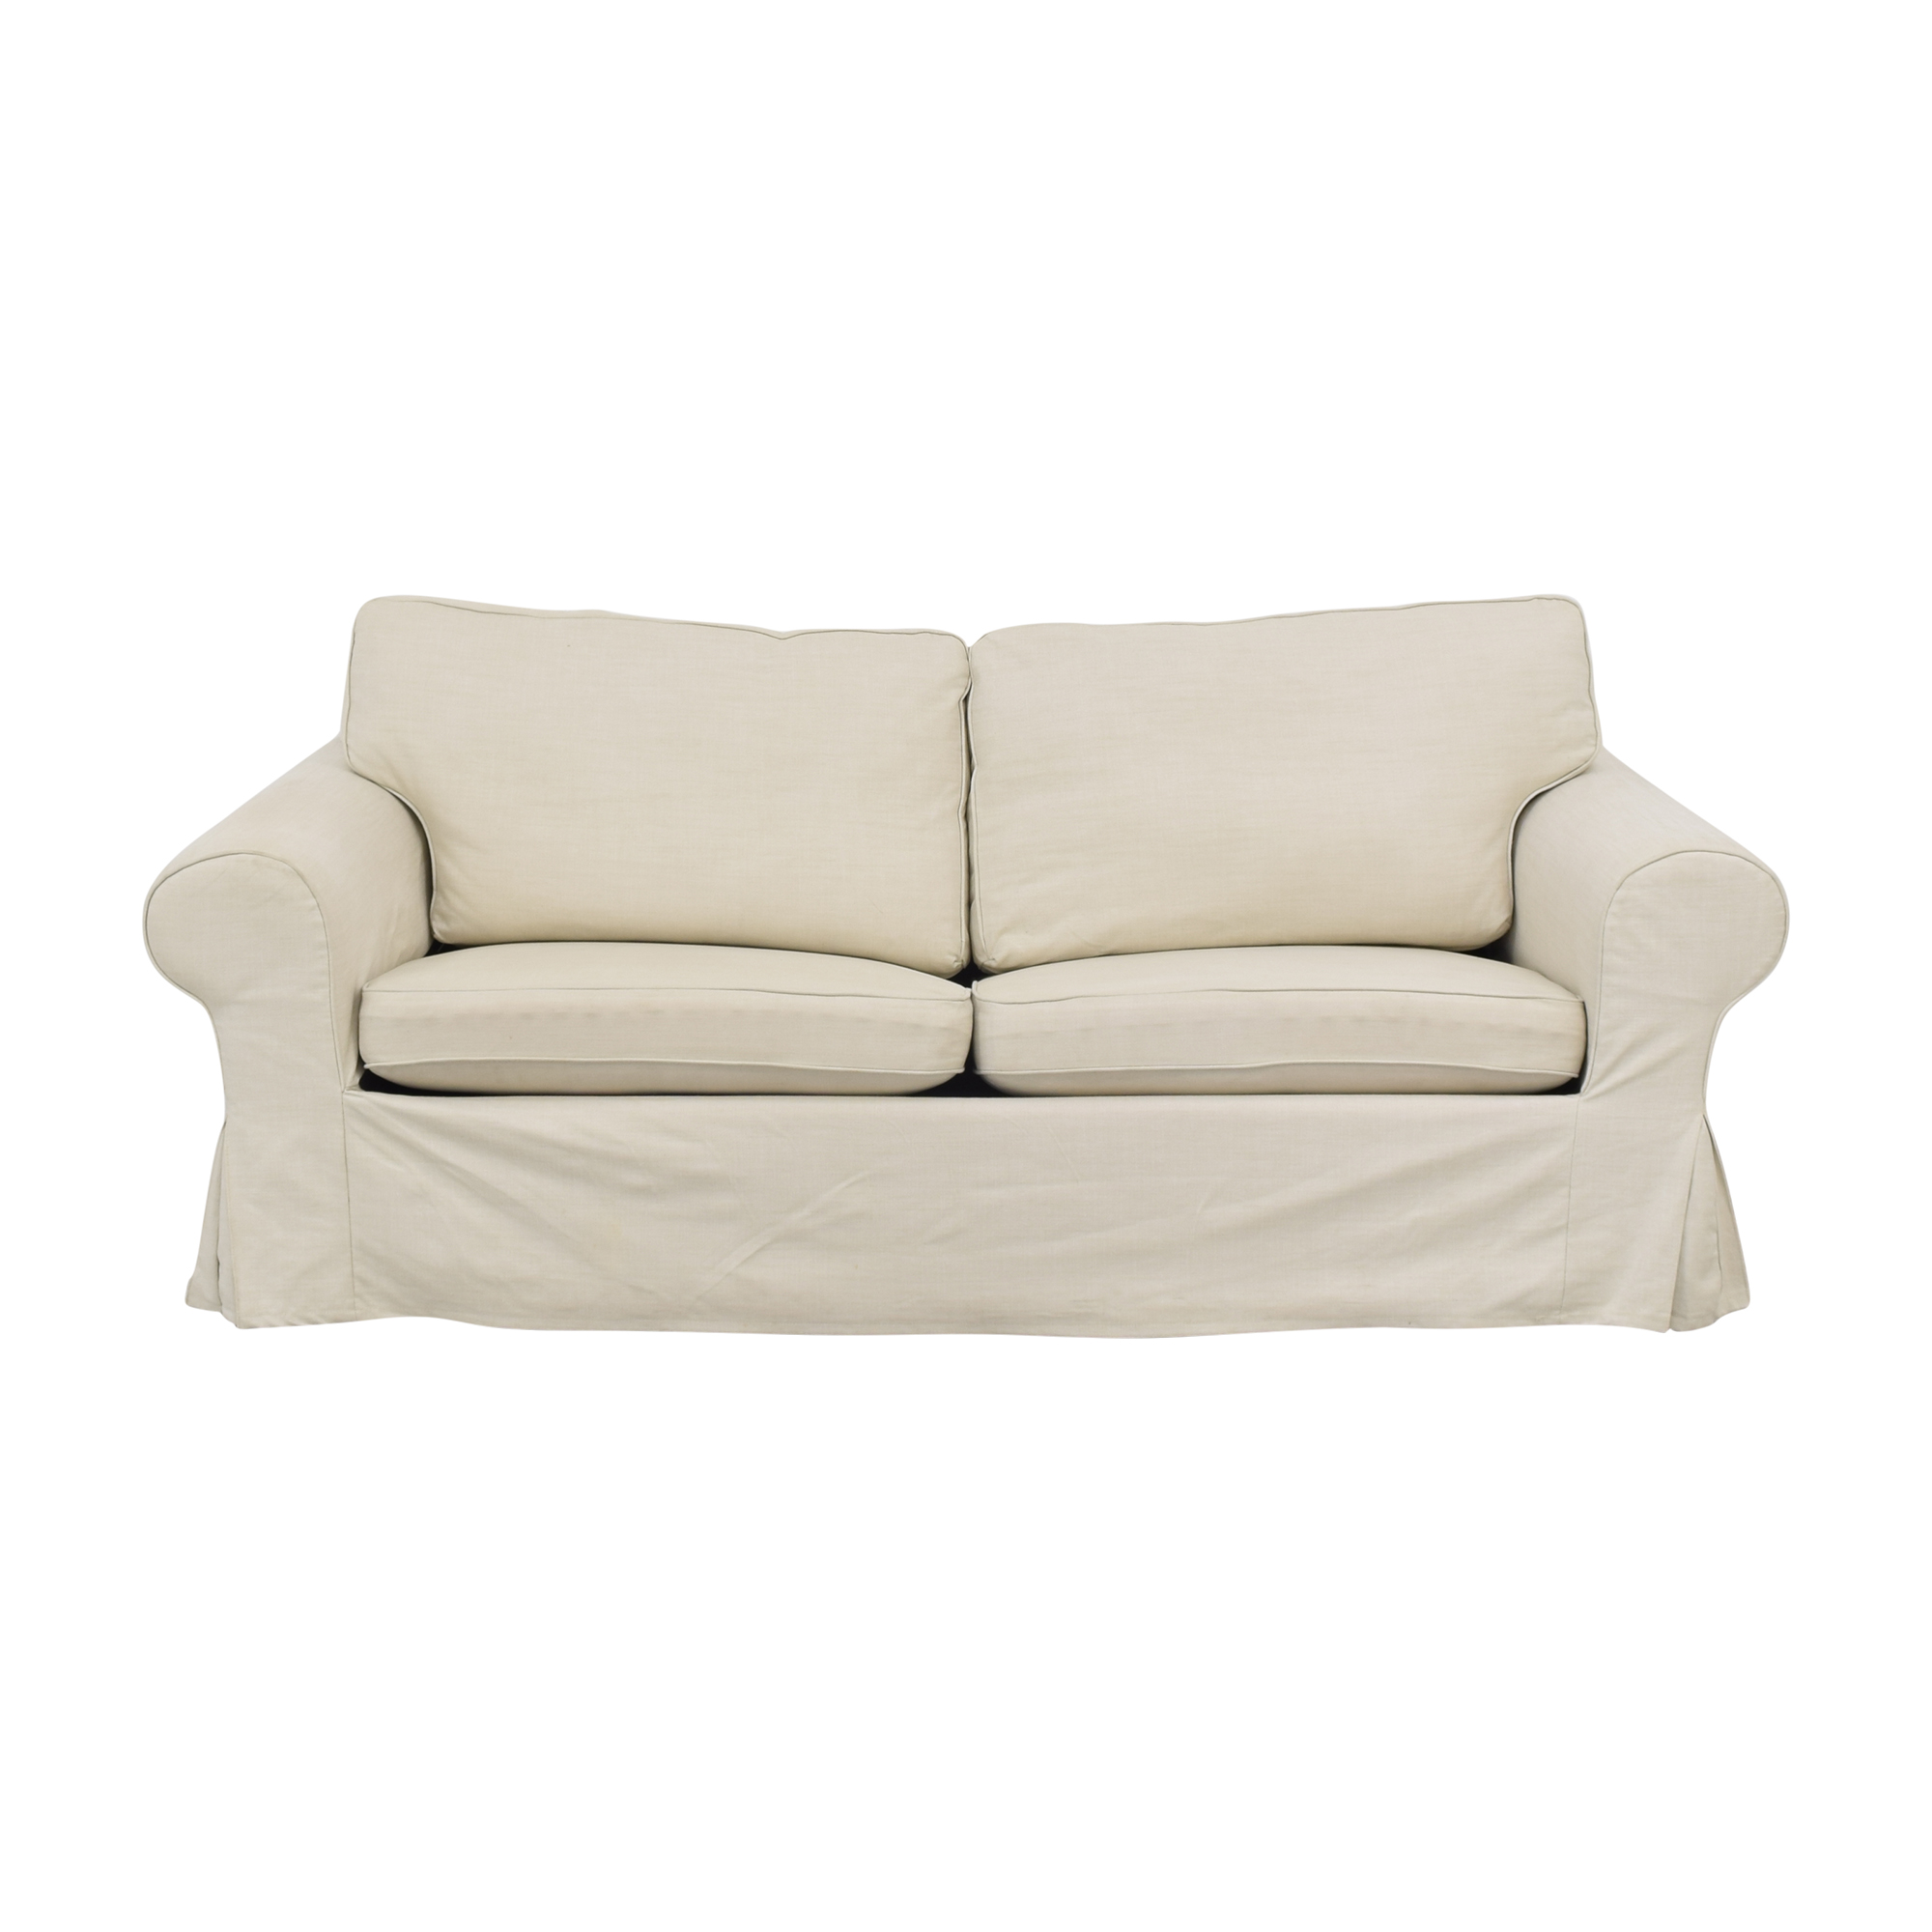 Full Size of Ektorp Sofa 47 Off Ikea Bed Sofas Xxxl Big Leder Federkern Mit Schlaffunktion Bora Weiß Grau Schilling Garnitur 2 Teilig Holzfüßen Ottomane Breit U Form Sofa Ektorp Sofa